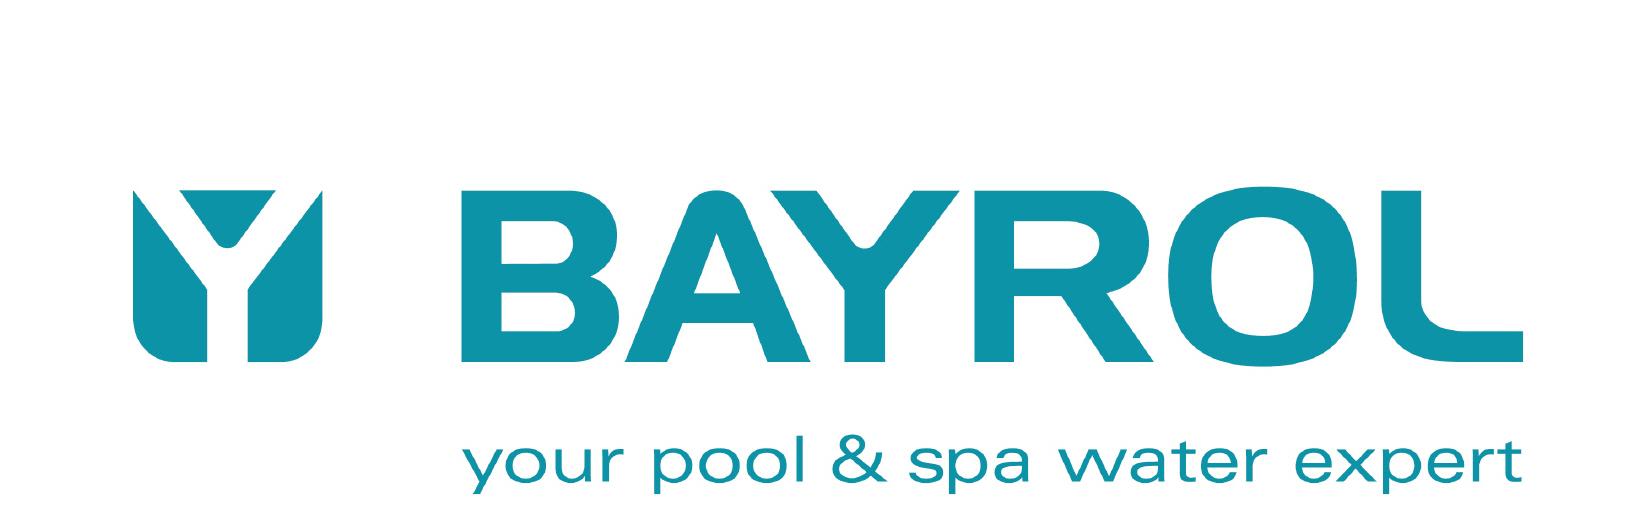 bayrol_logo-with-claim_pantone320_with-correct